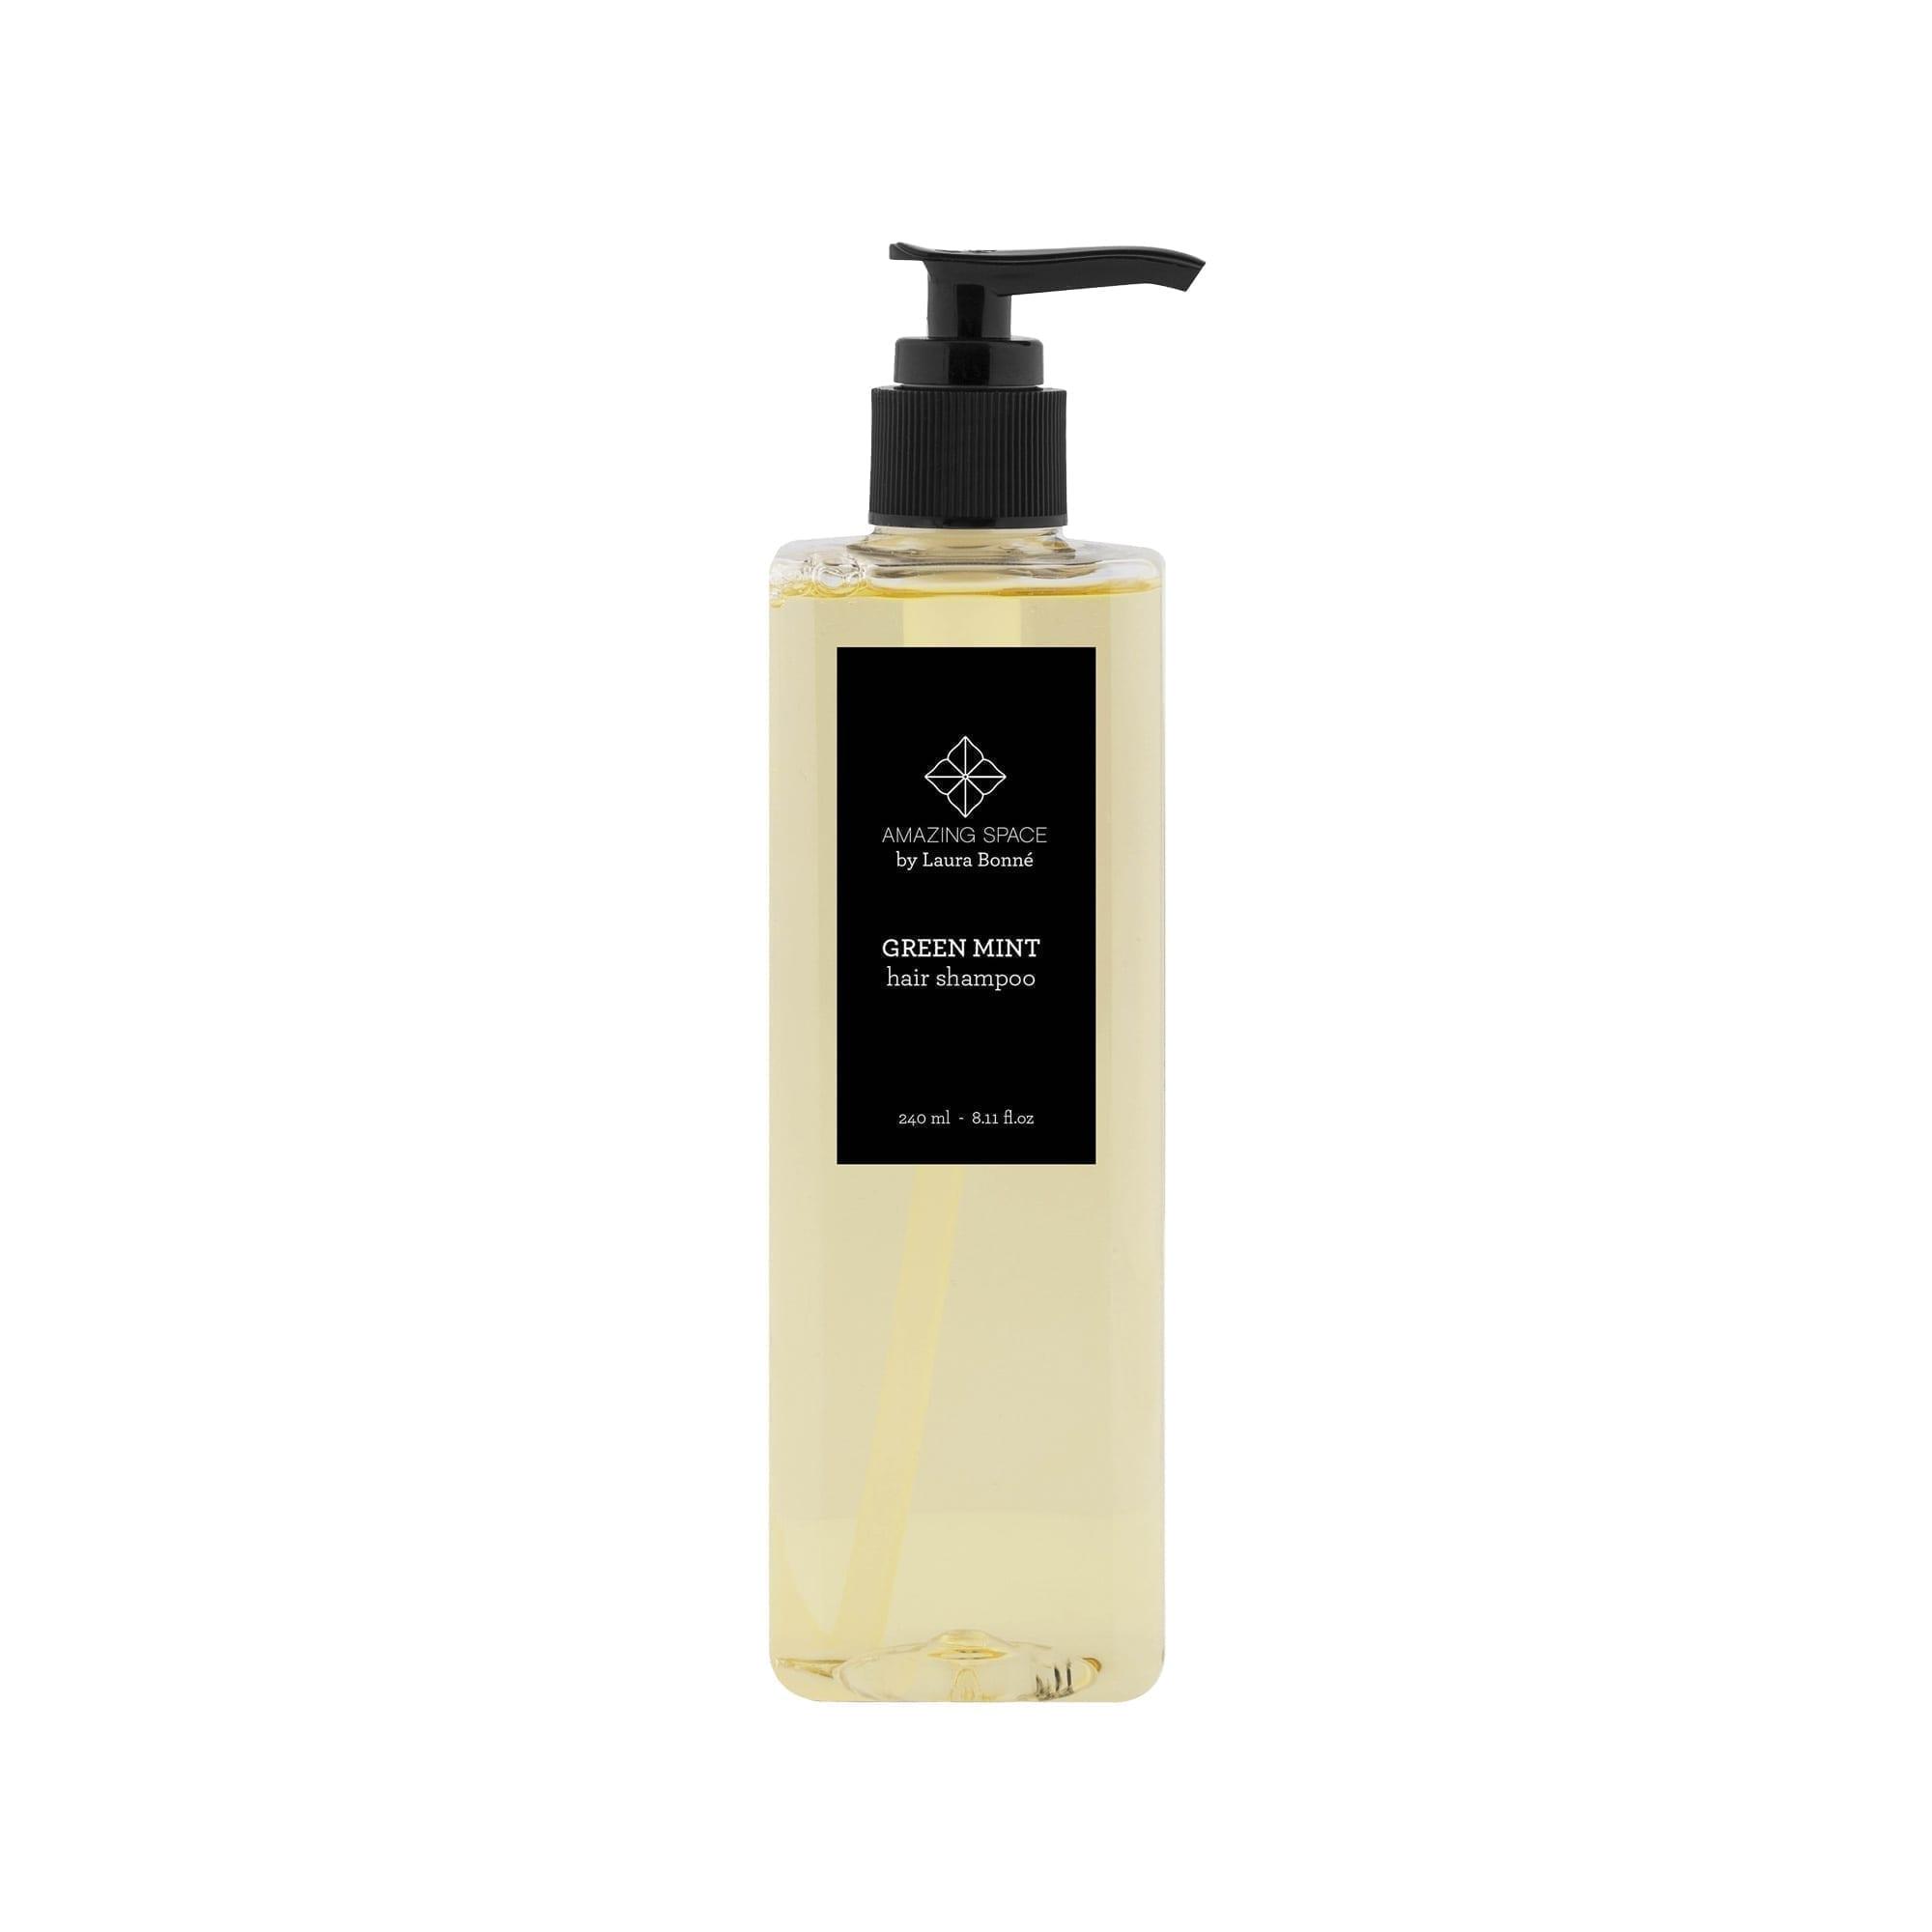 Green Mint - Hair Shampoo - Amazing Space